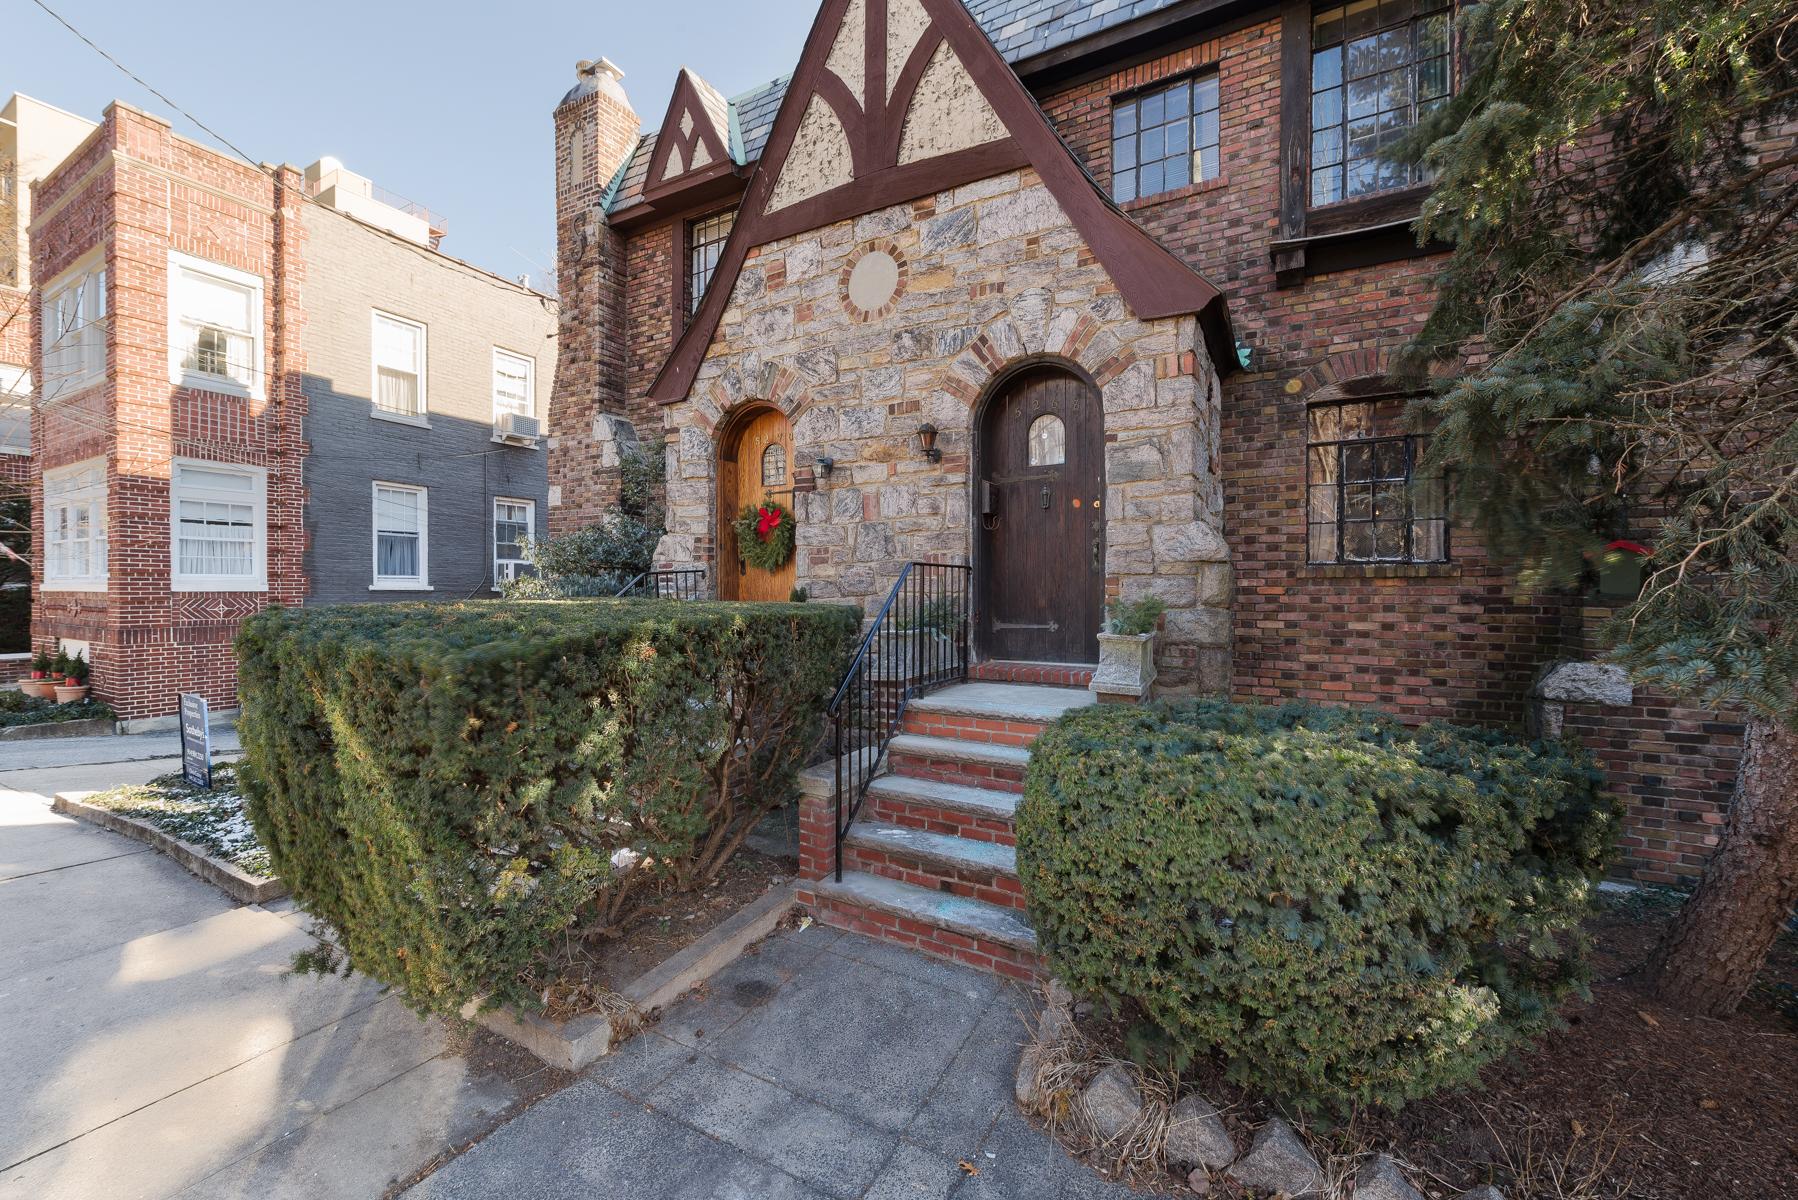 獨棟家庭住宅 為 出售 在 Prewar Single Family Home 5268 Post Road Riverdale, 紐約州, 10471 美國